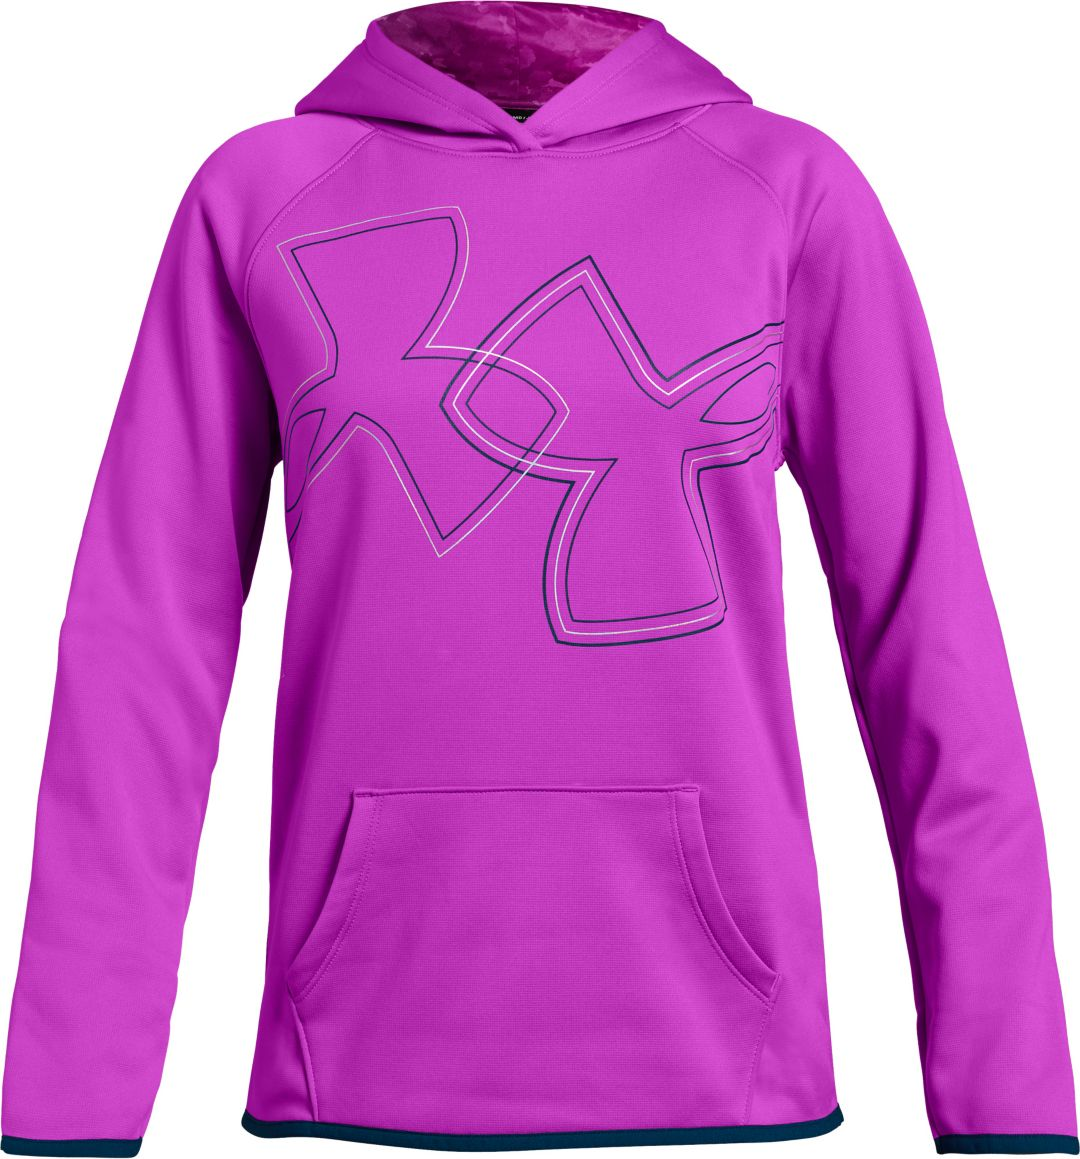 46689f43 Under Armour Girls' Armour Fleece Dual Logo Graphic Hoodie